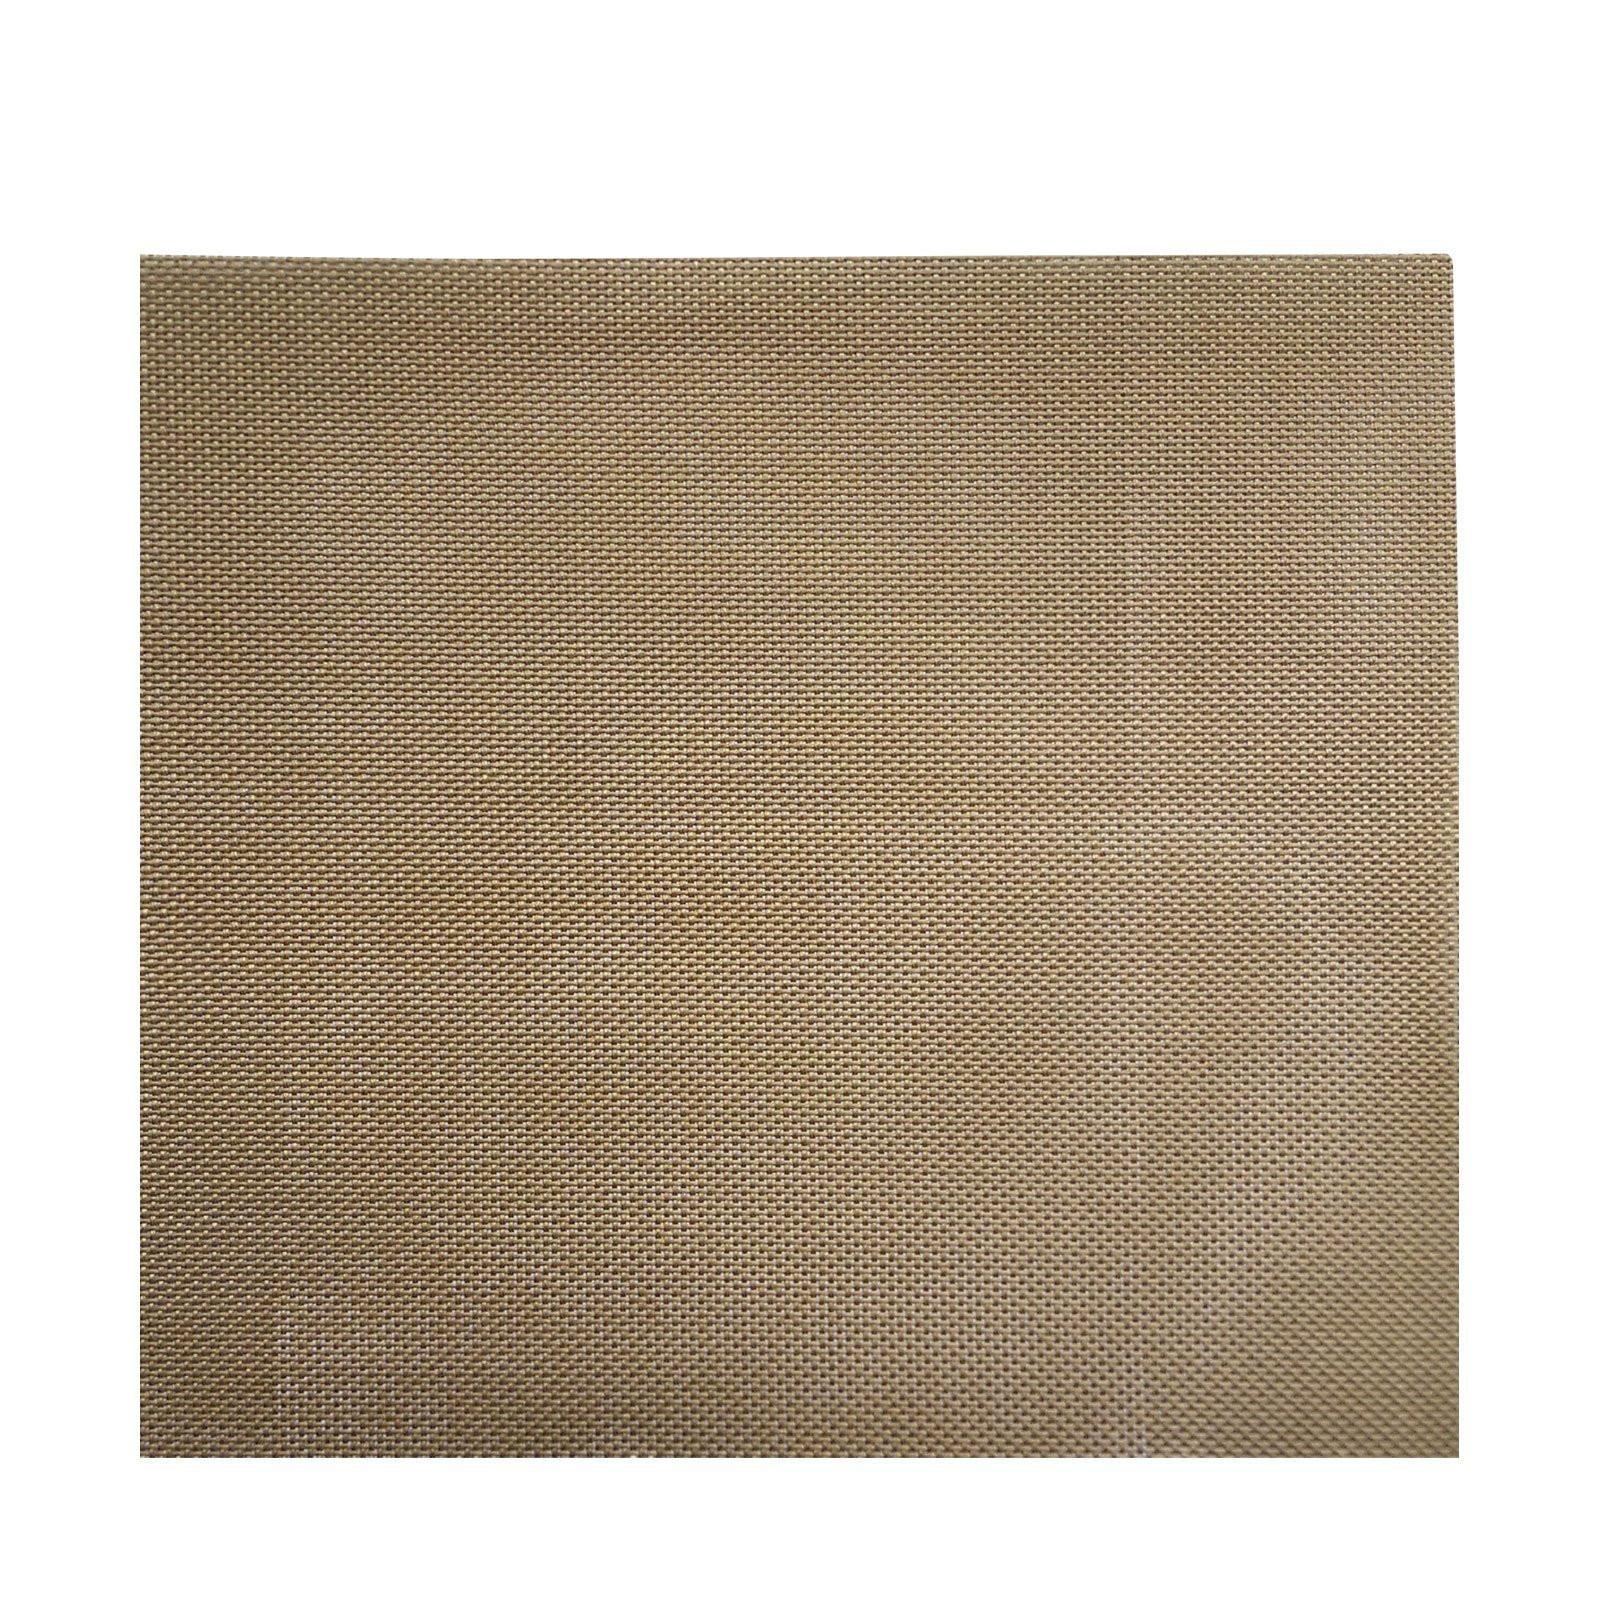 BioChef Arizona 6/9 Tray Mesh Sheet - 4 Packs